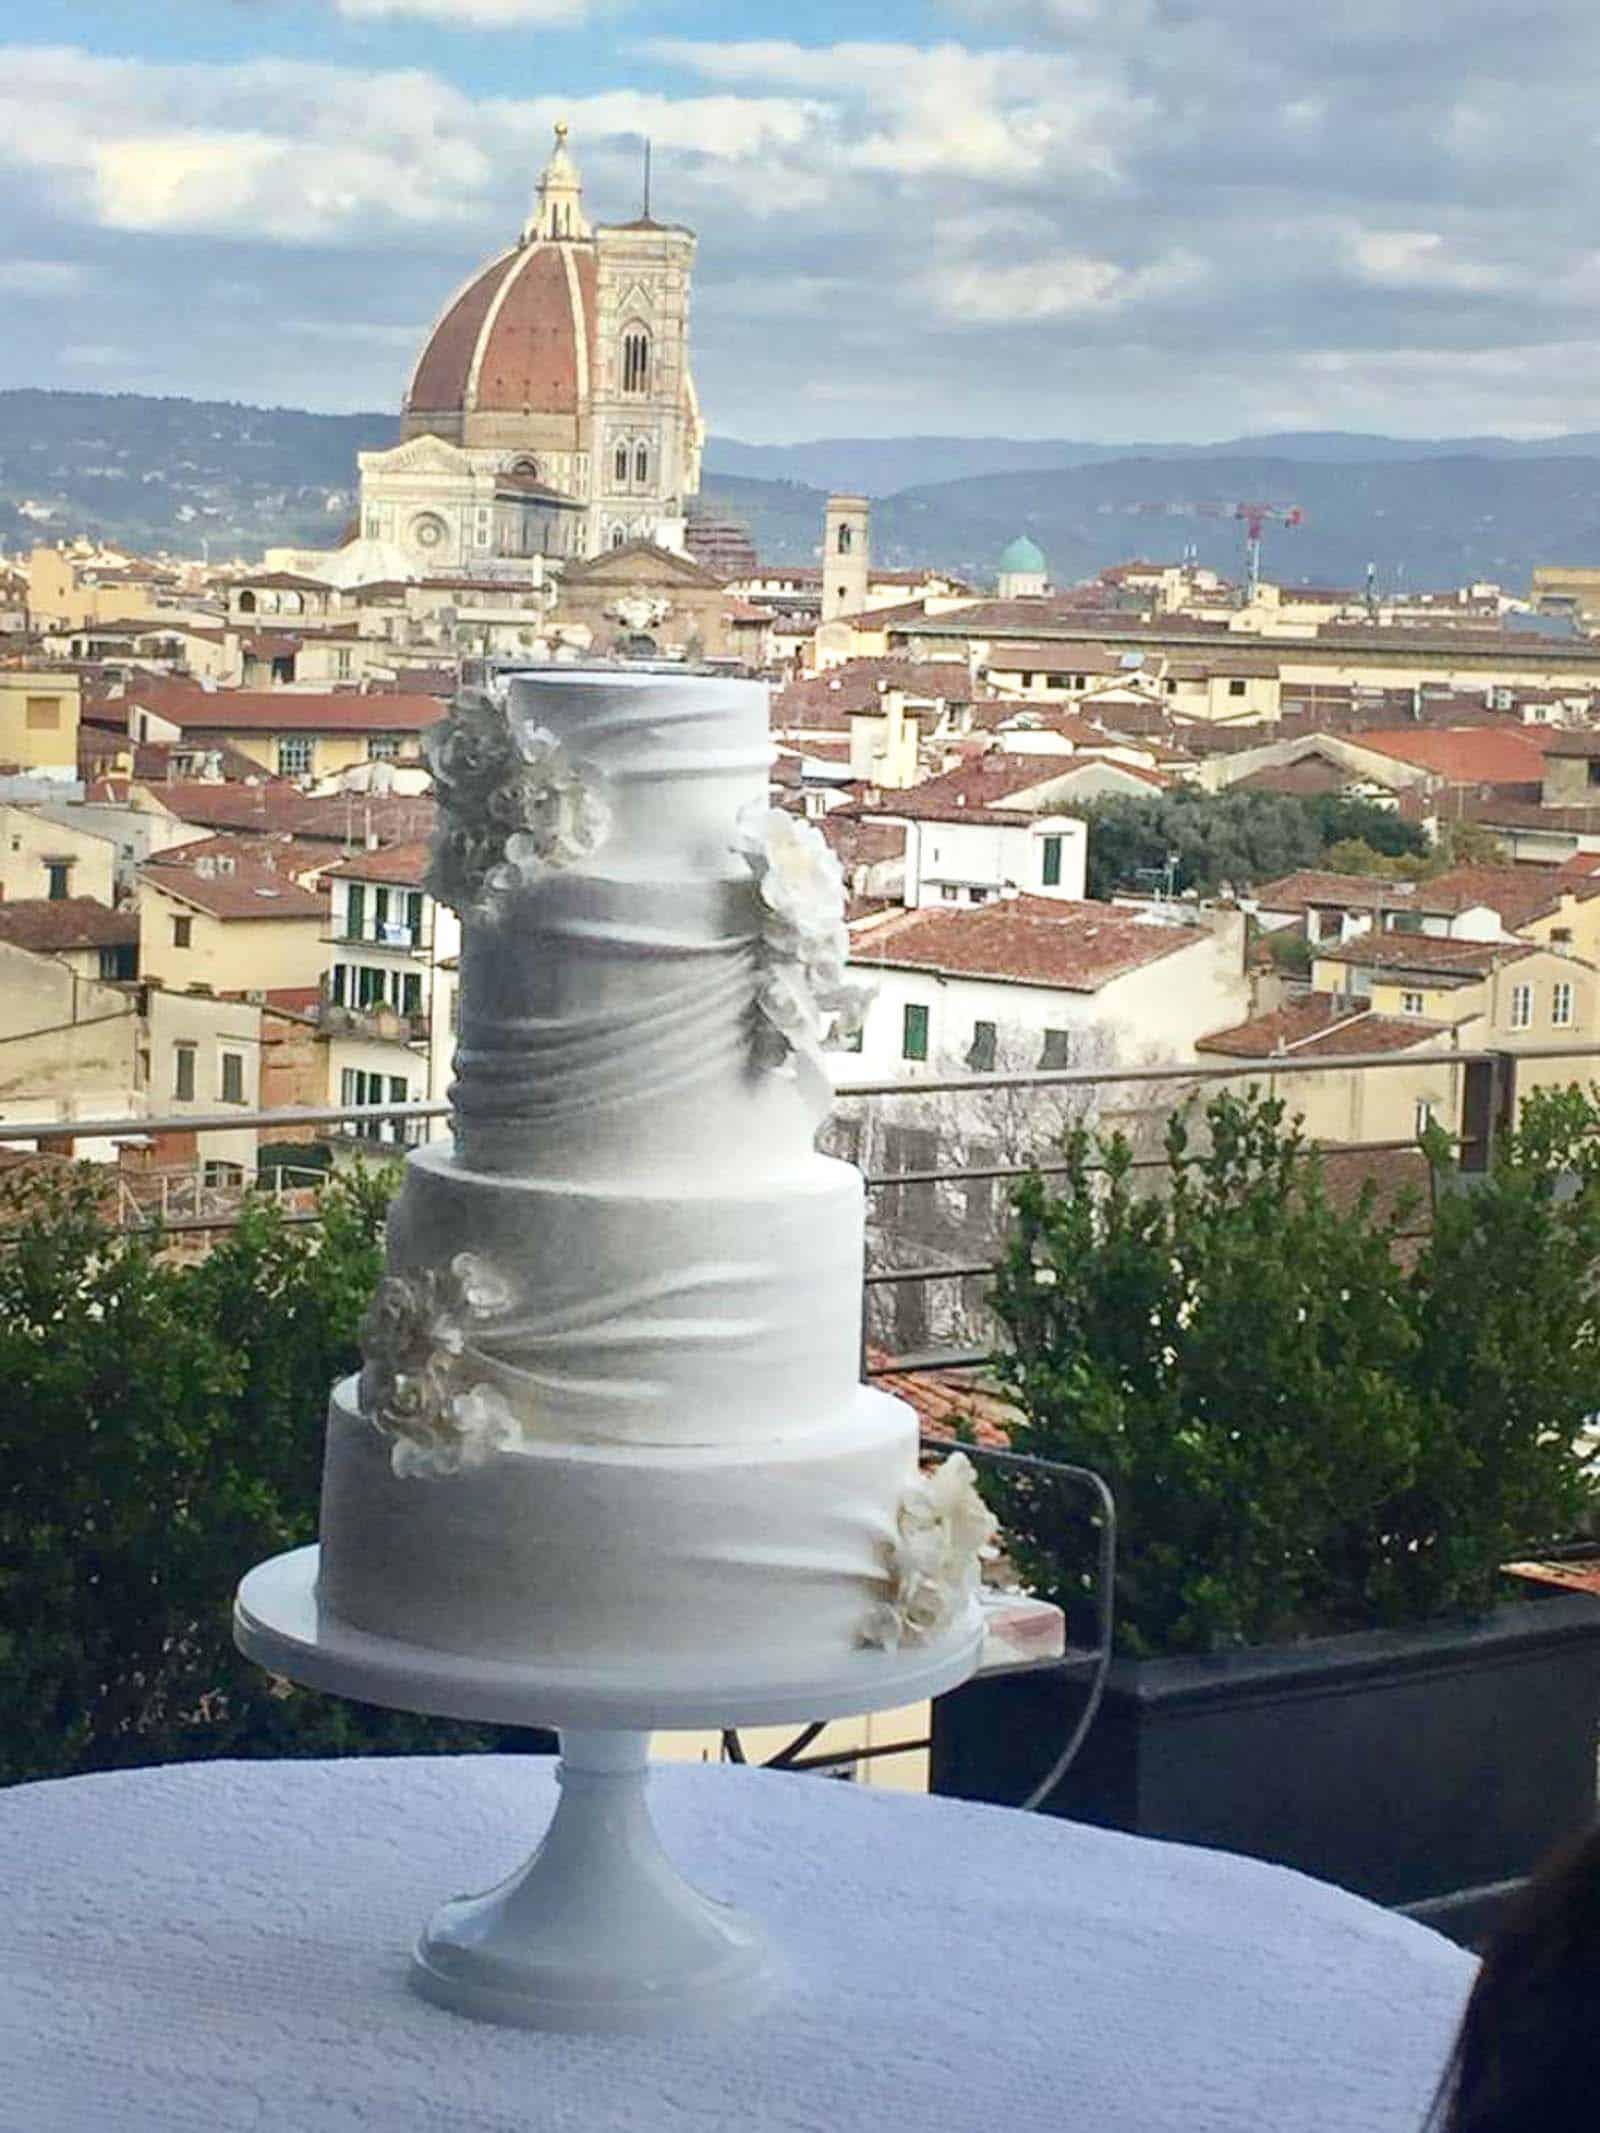 Dreamy Wedding Cake at St. Regis